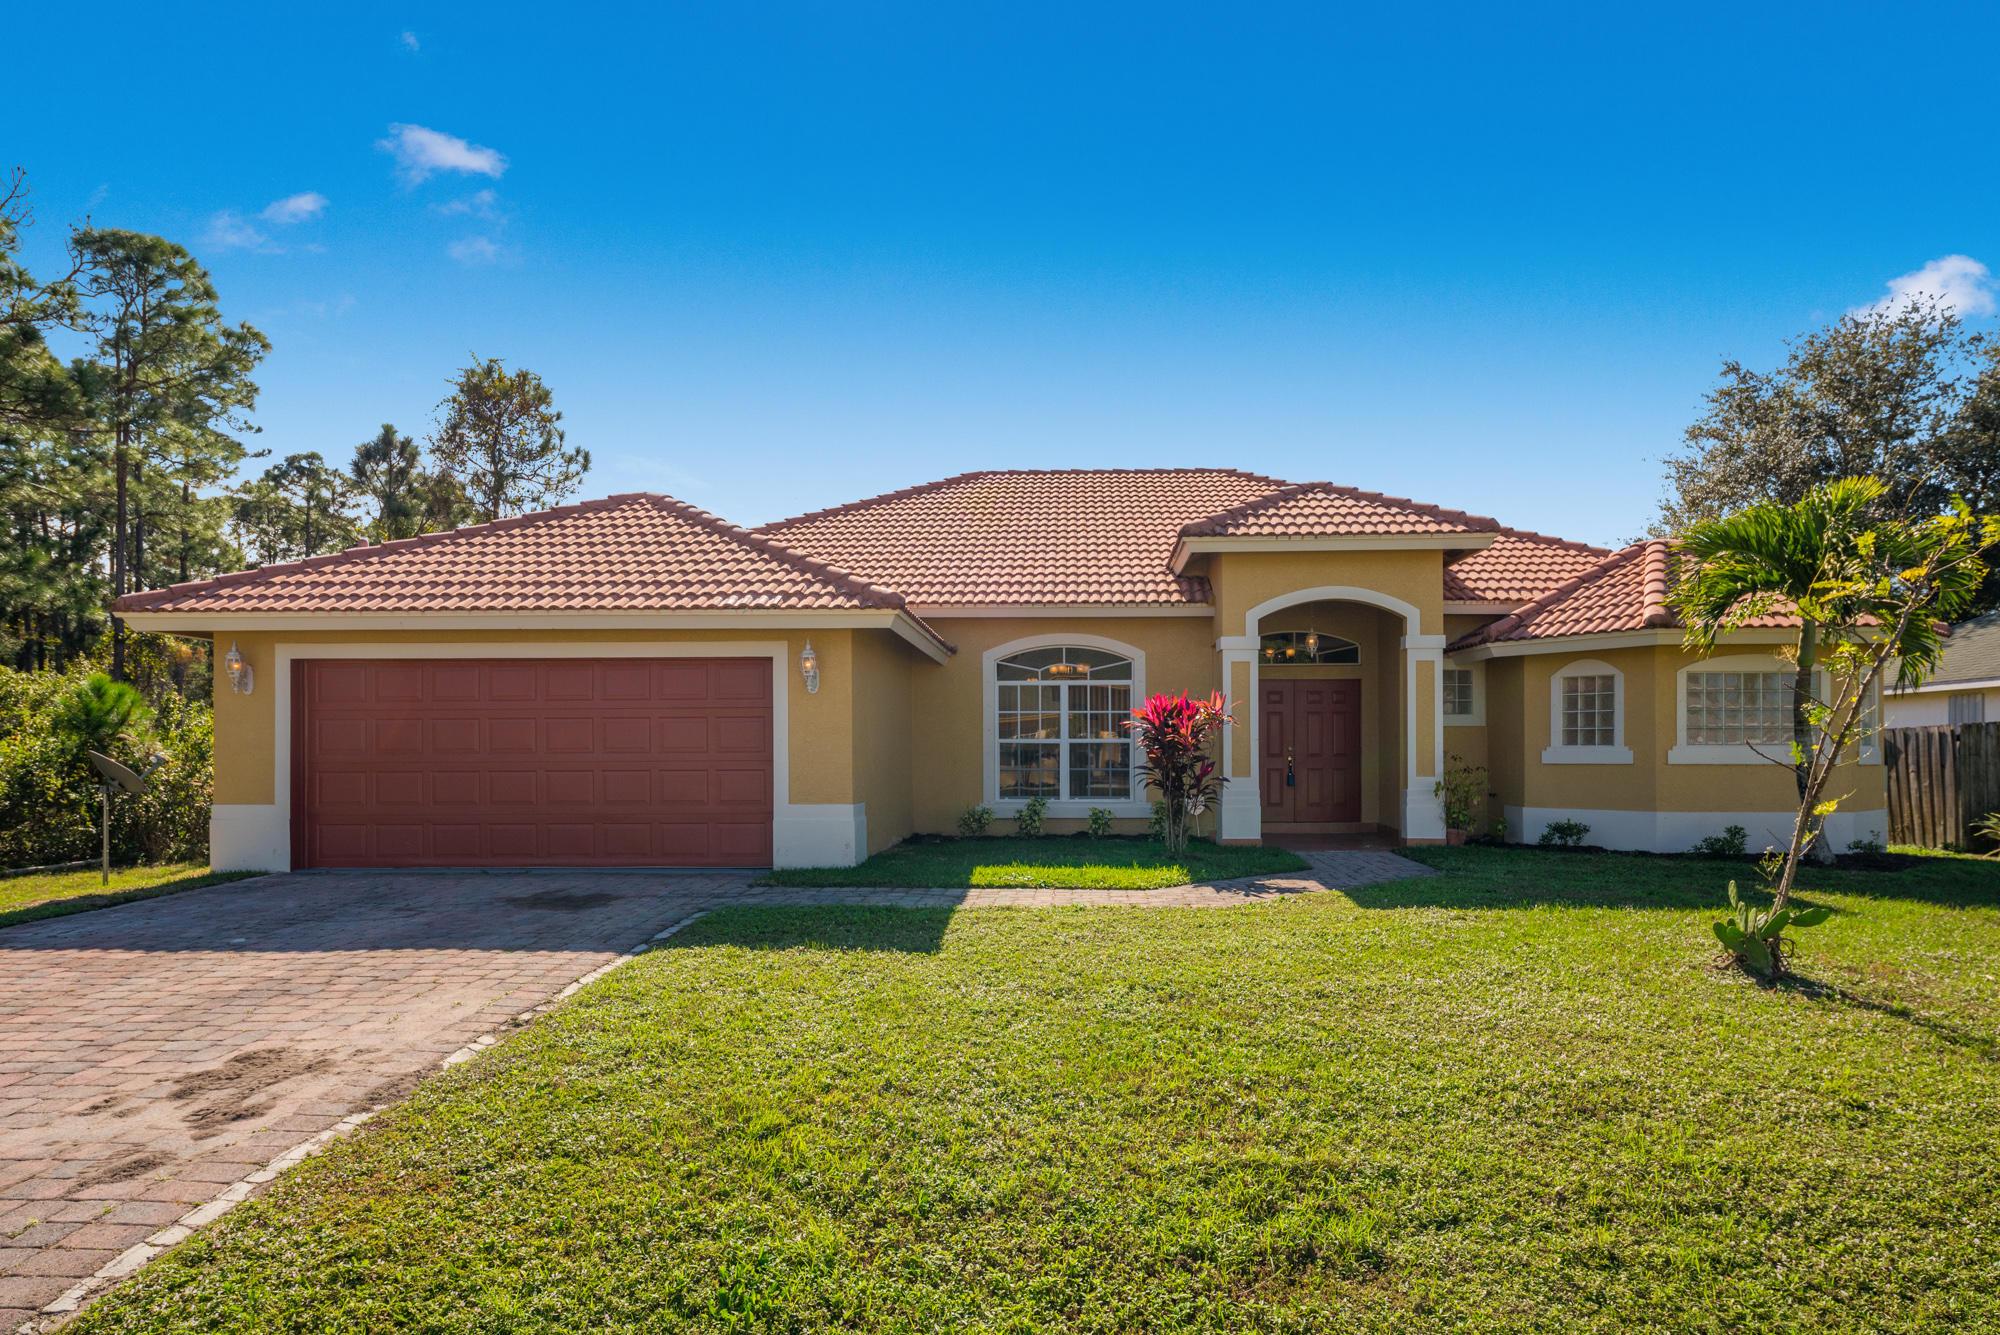 1750 Sw Desert Avenue, Port Saint Lucie, FL 34953